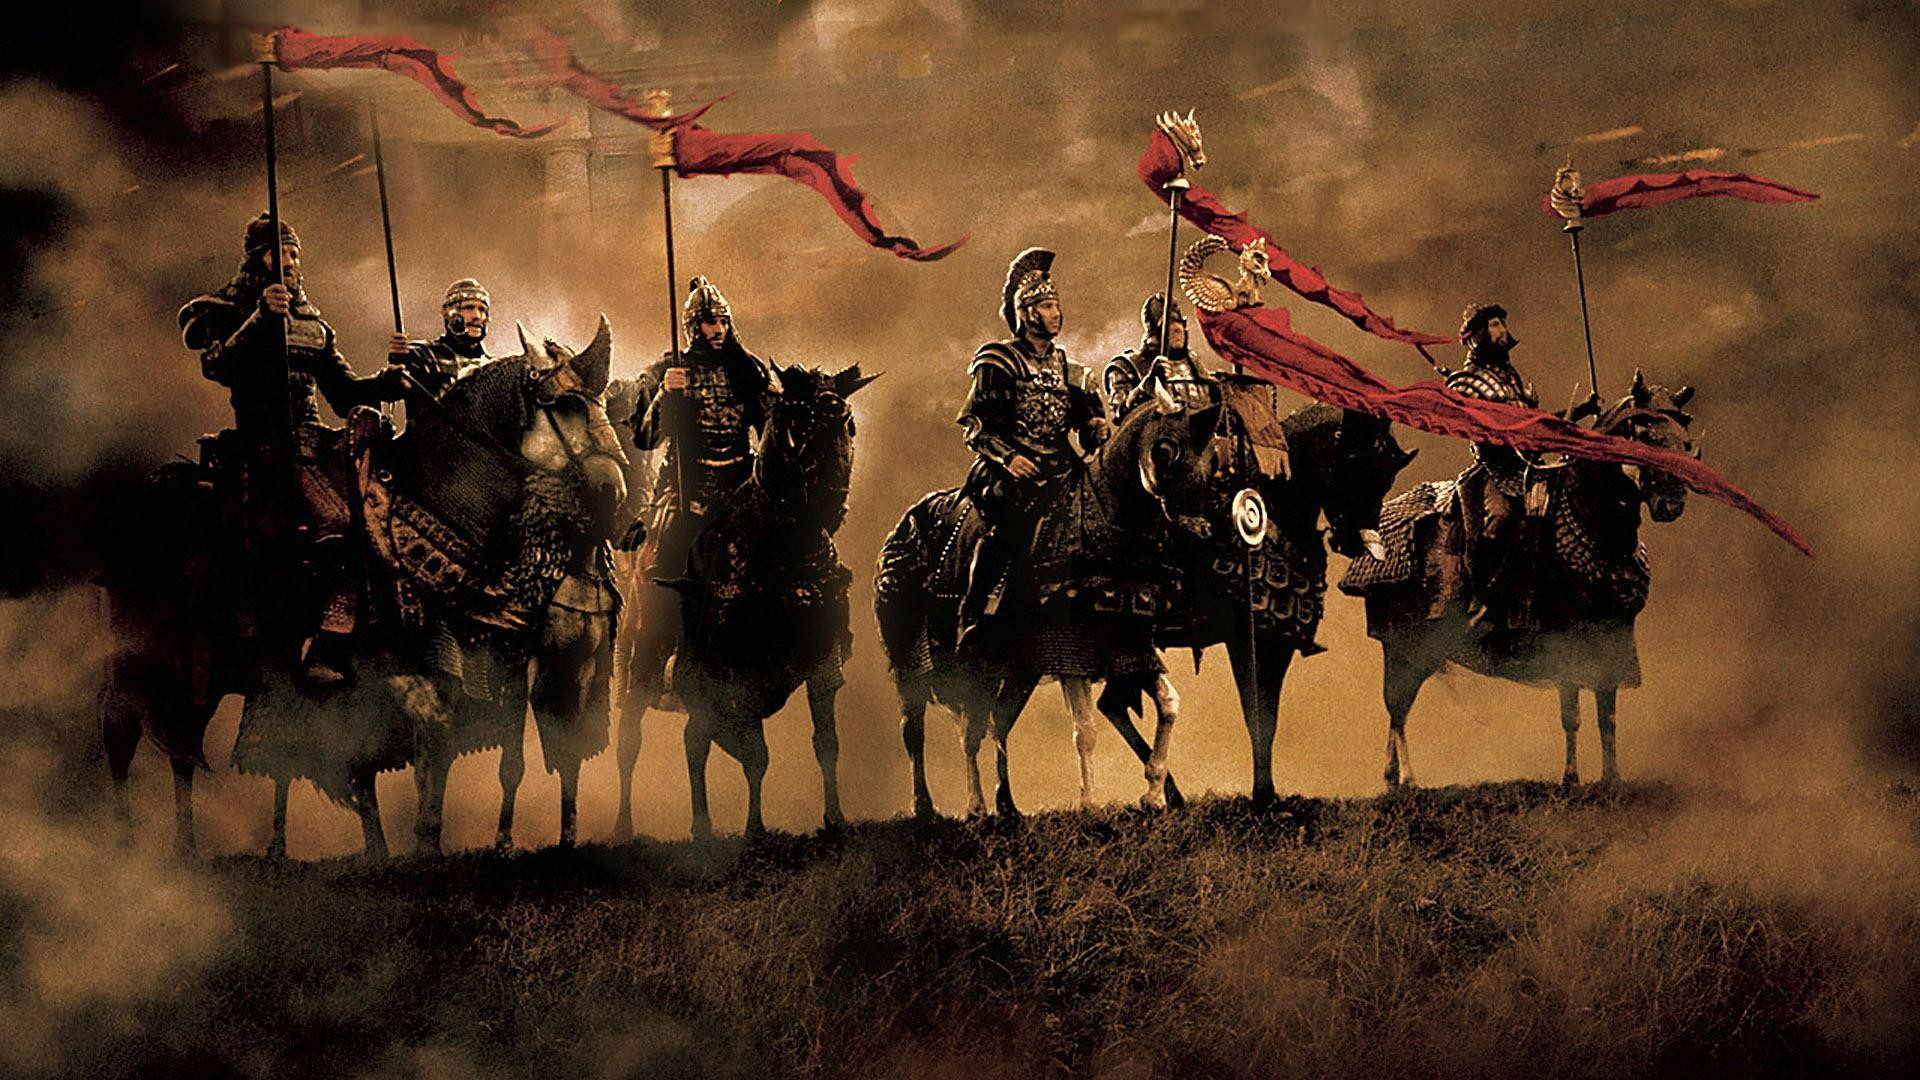 King Arthur Legend Of The Sword 4K .